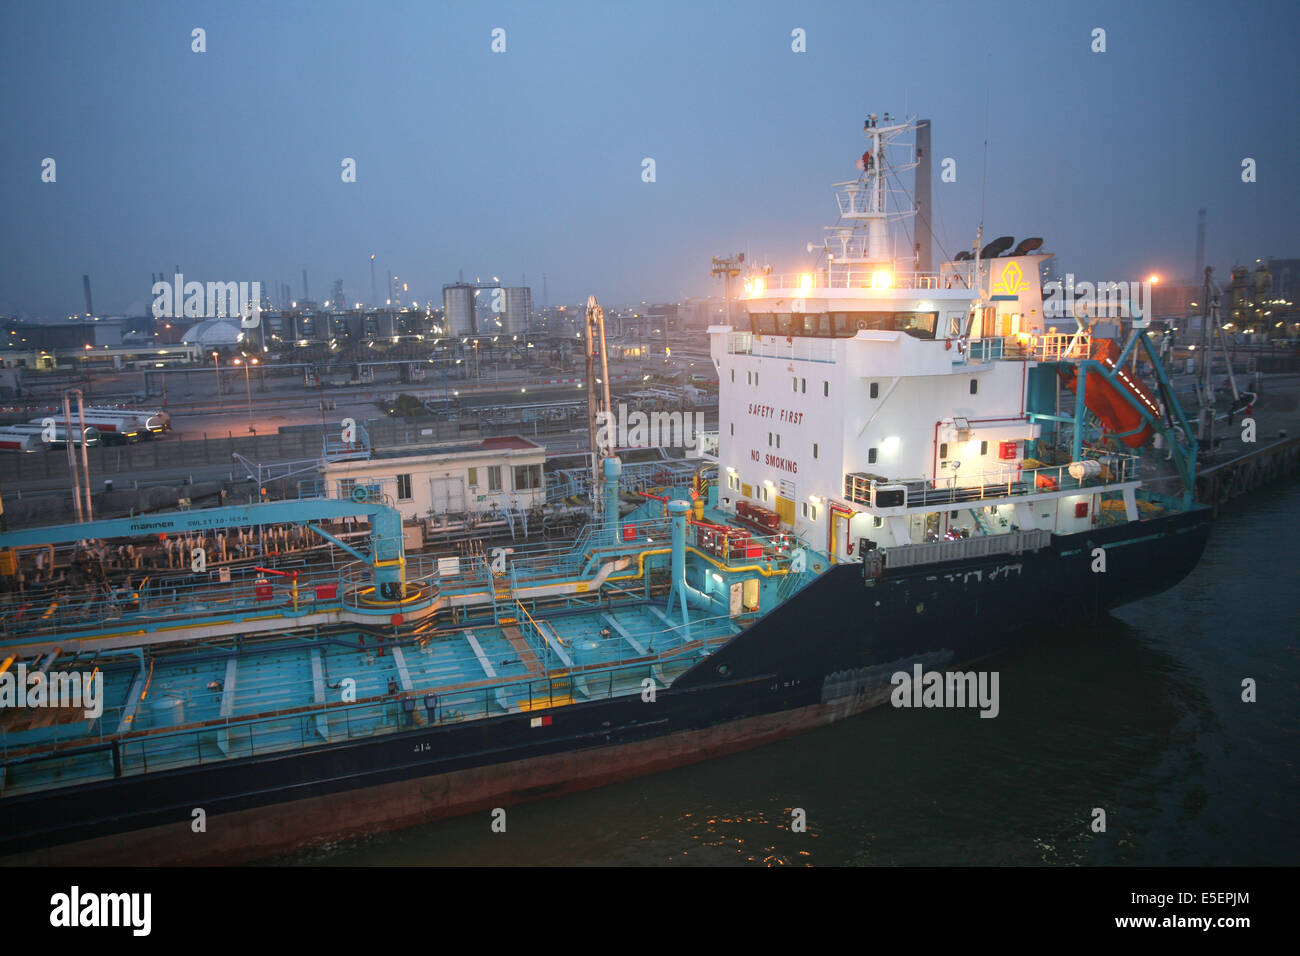 Port terminal oil stock photos port terminal oil stock images alamy - Grand port maritime de rouen ...